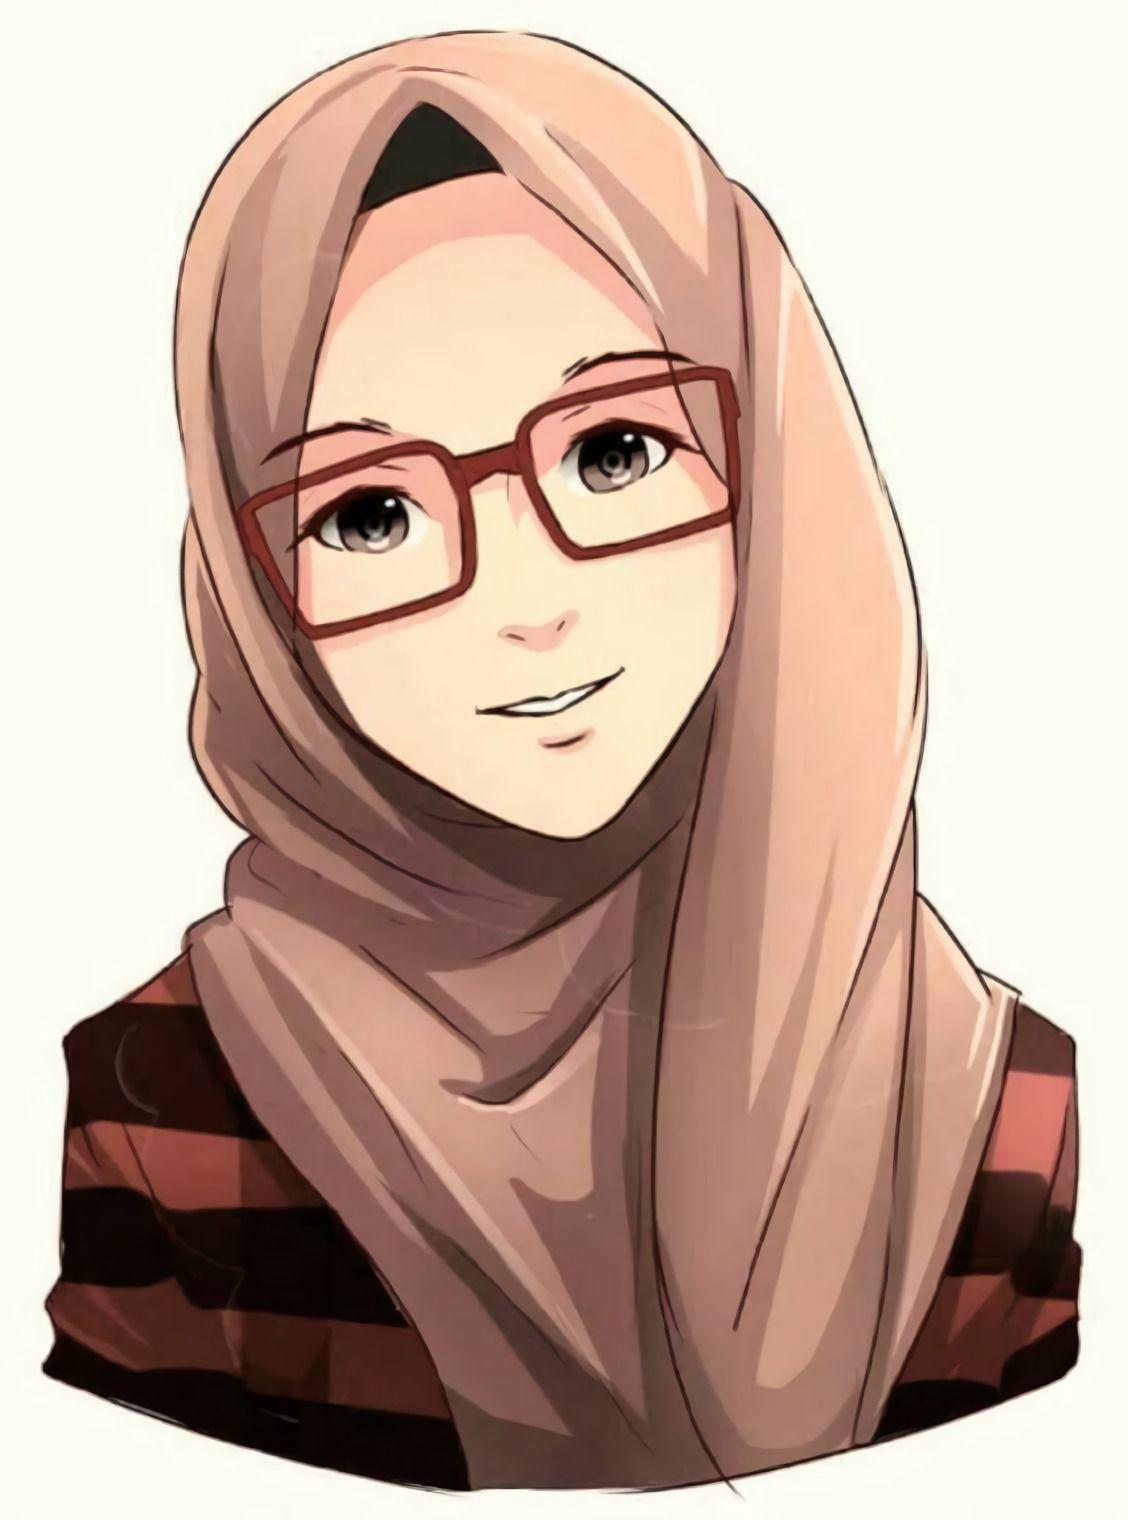 Muslimah 1 di 2020 Animasi, Kartun, Gambar anime